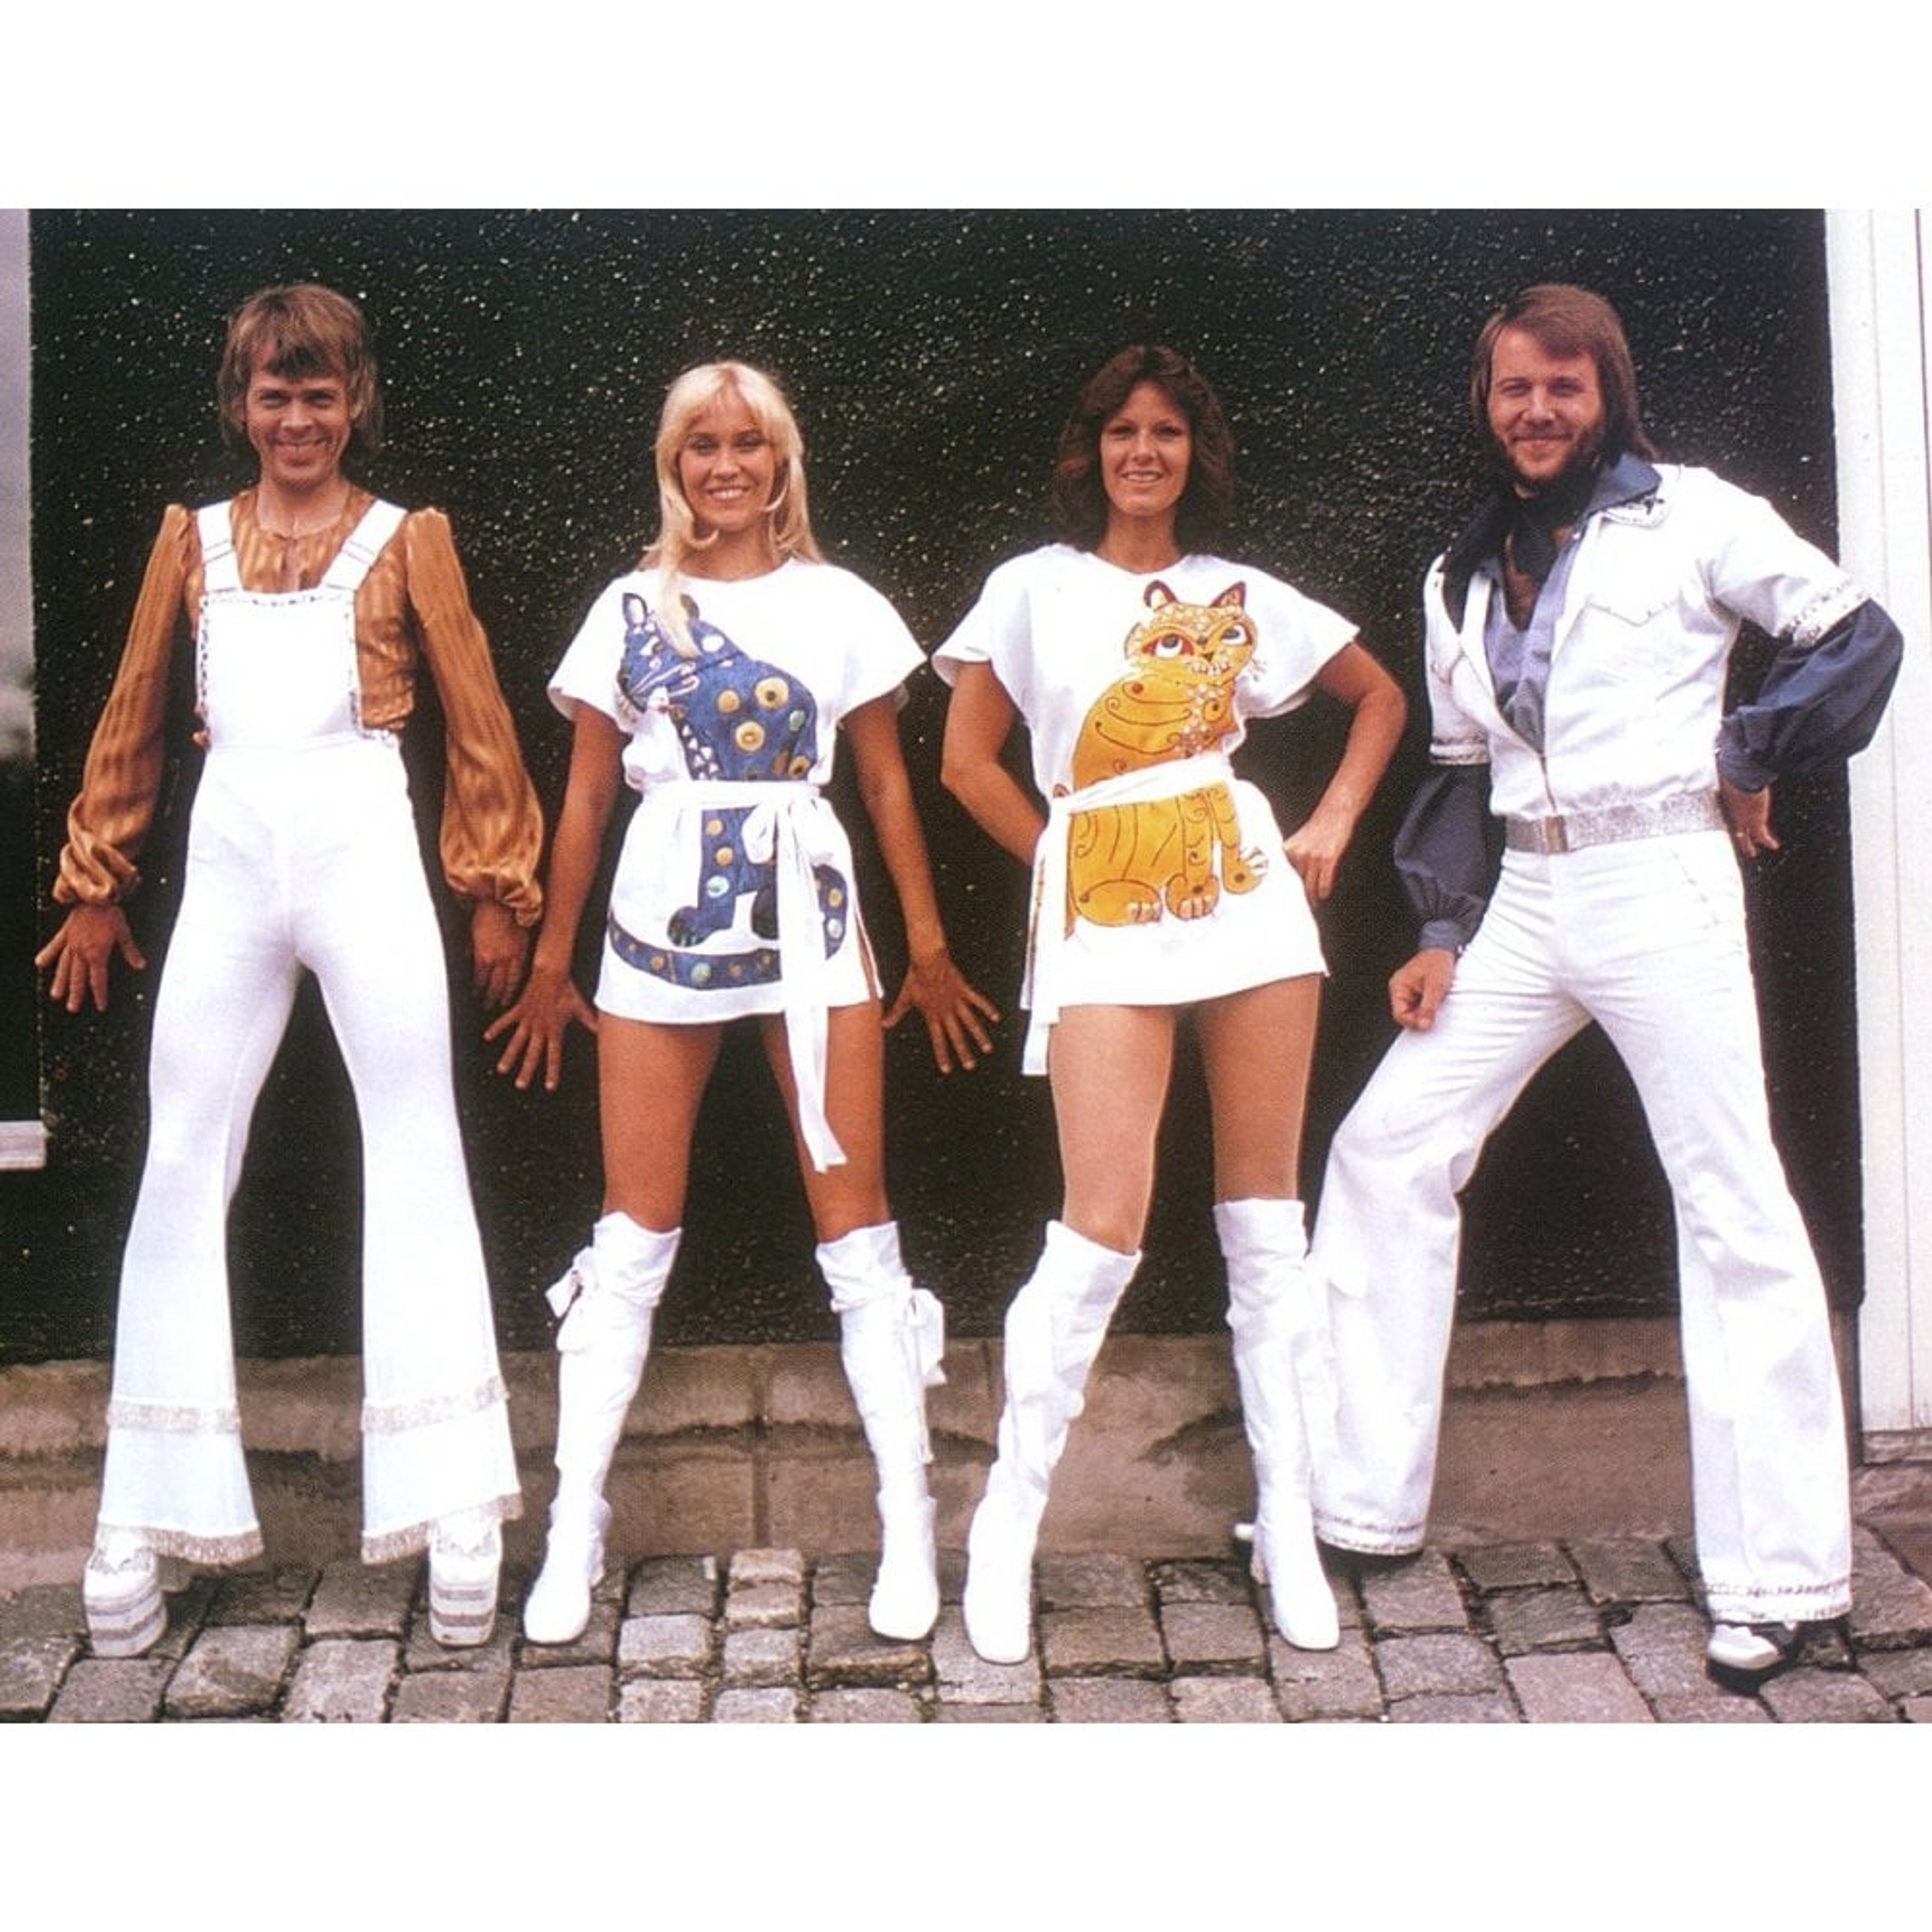 1bc2deb963b89 Blue Cat (As Worn By Agnetha Faltskog, ABBA) T-Shirt - from ...